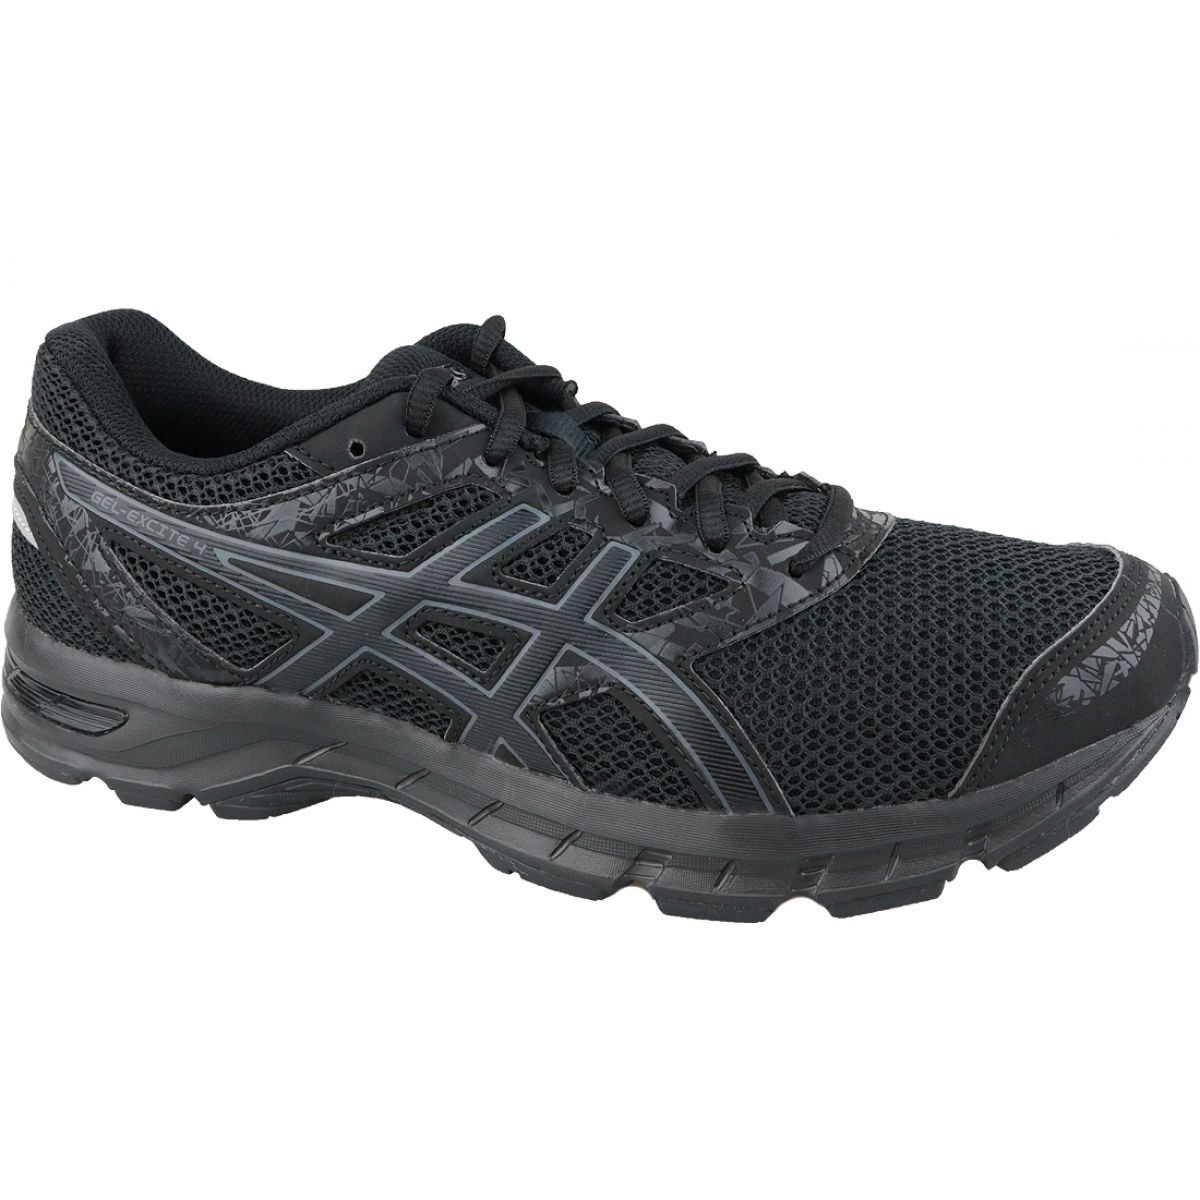 métrico construir Superioridad  training #Running #Sport #Asics #Running #Shoes #Asics #Gel-Excite #4 #M  #T6E3N-9097 #Black | Asics running shoes, Running shoes, Asics